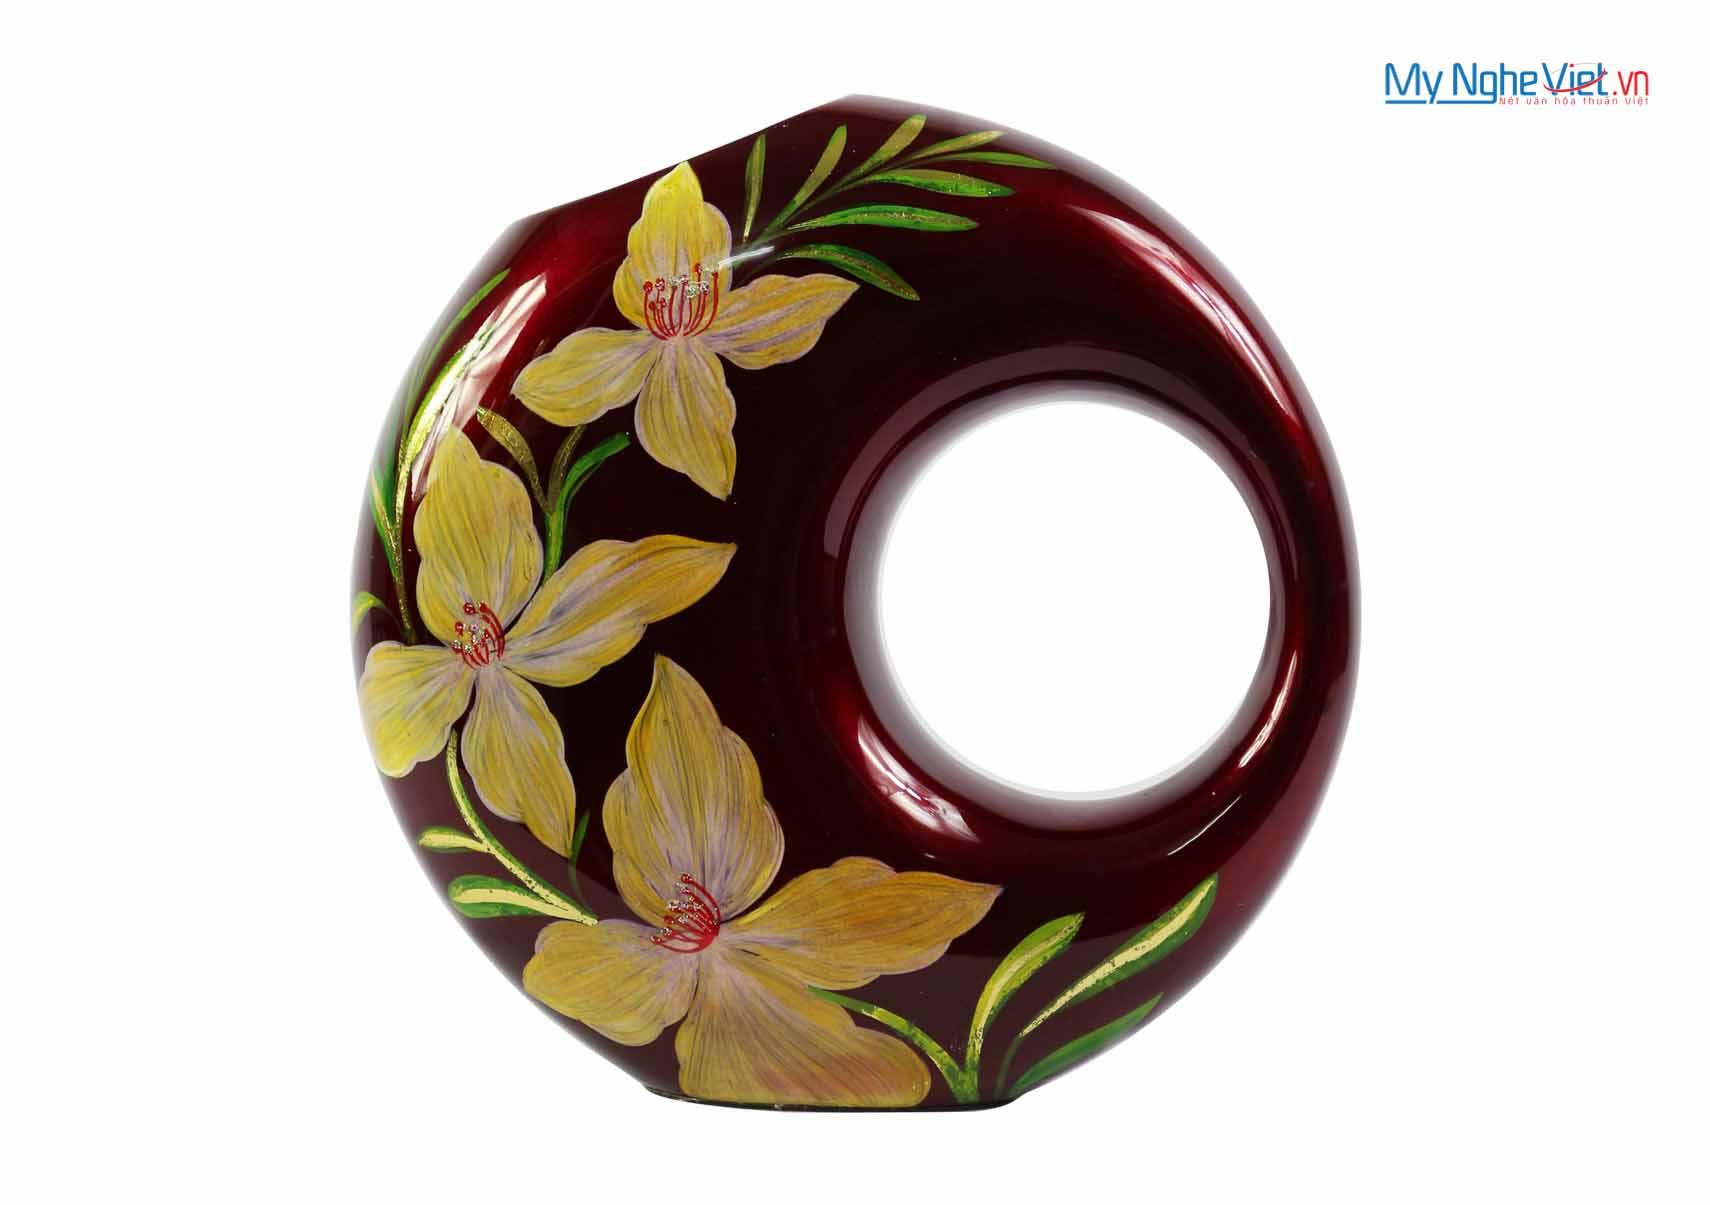 Lacquer vase MNV-LHSM03-2